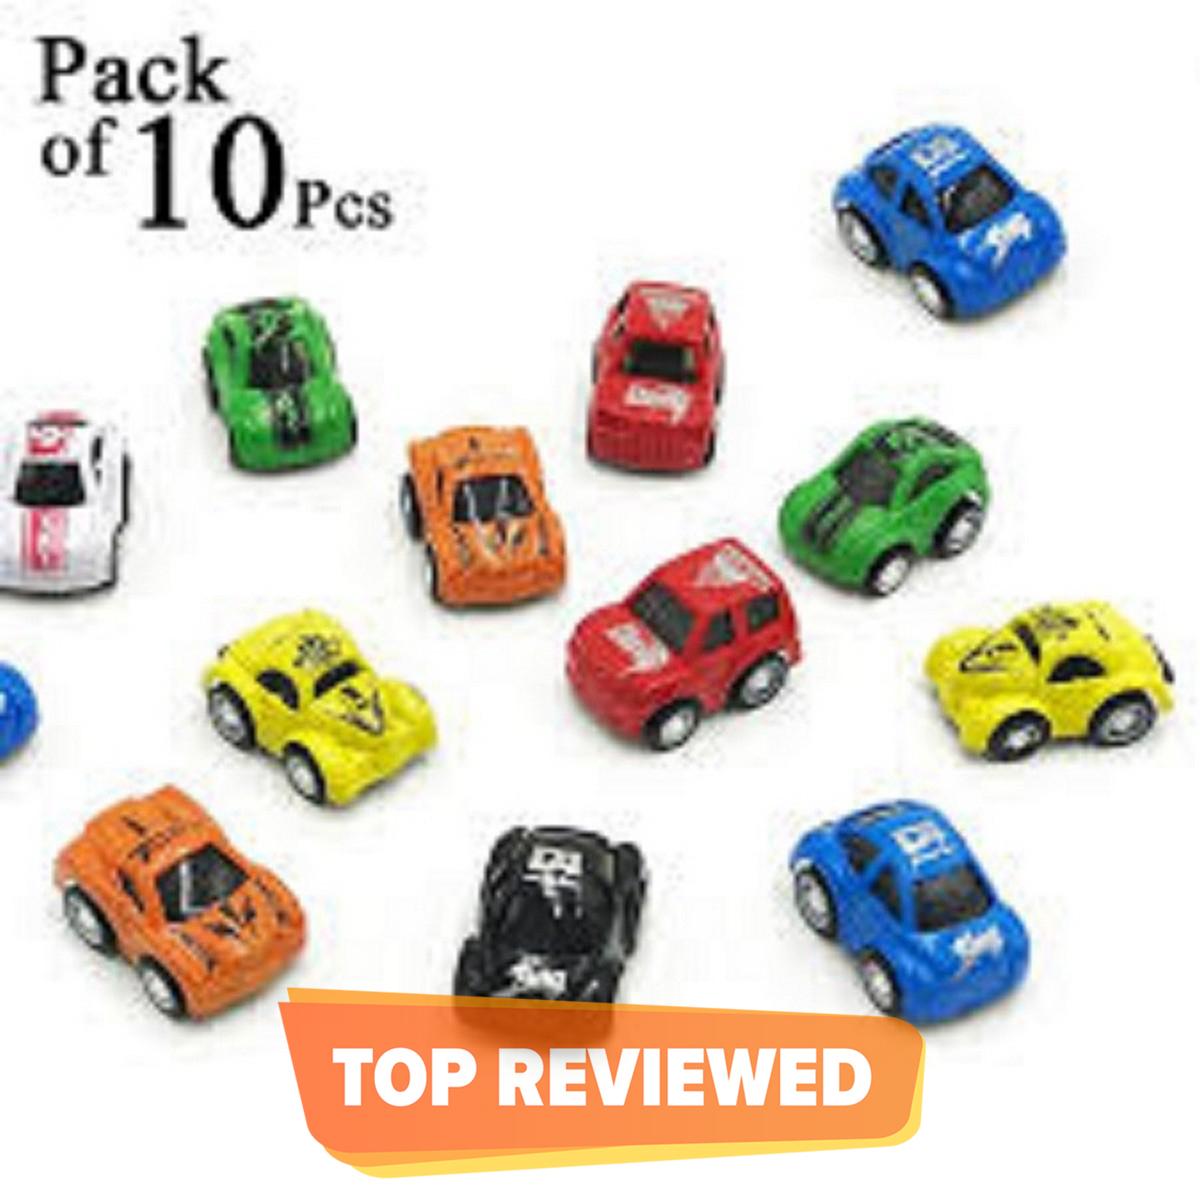 Pack of 10 - Pull Back Mini Auto Super Power Car Set For Kids & Boys Toys